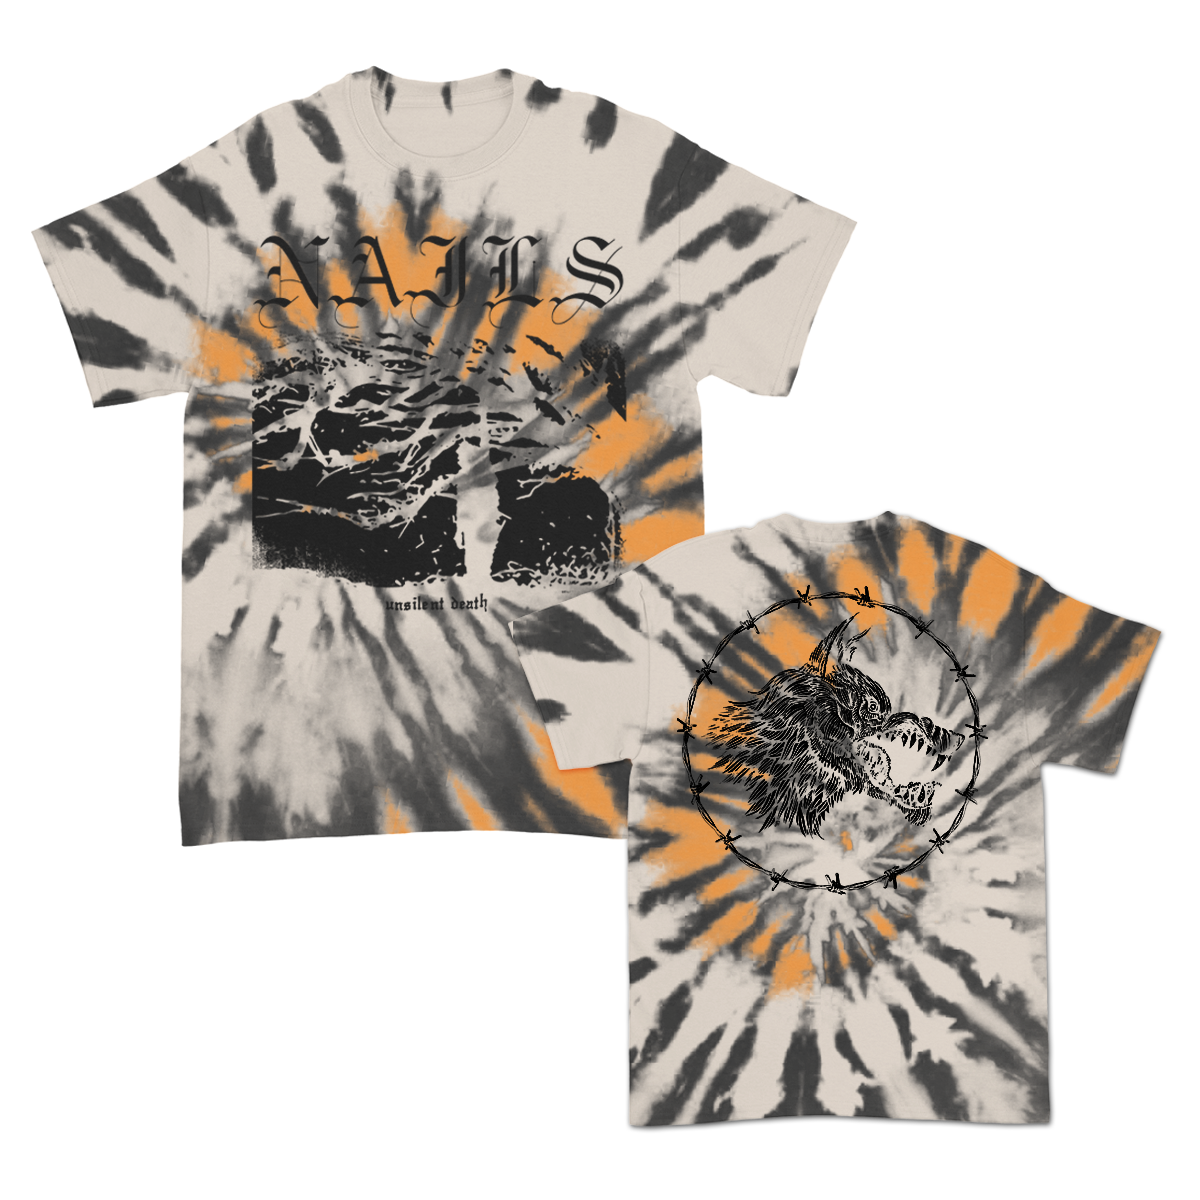 IMAGE | Unsilent Death Ltd. Dye T-Shirt (Sand/Black/Orange